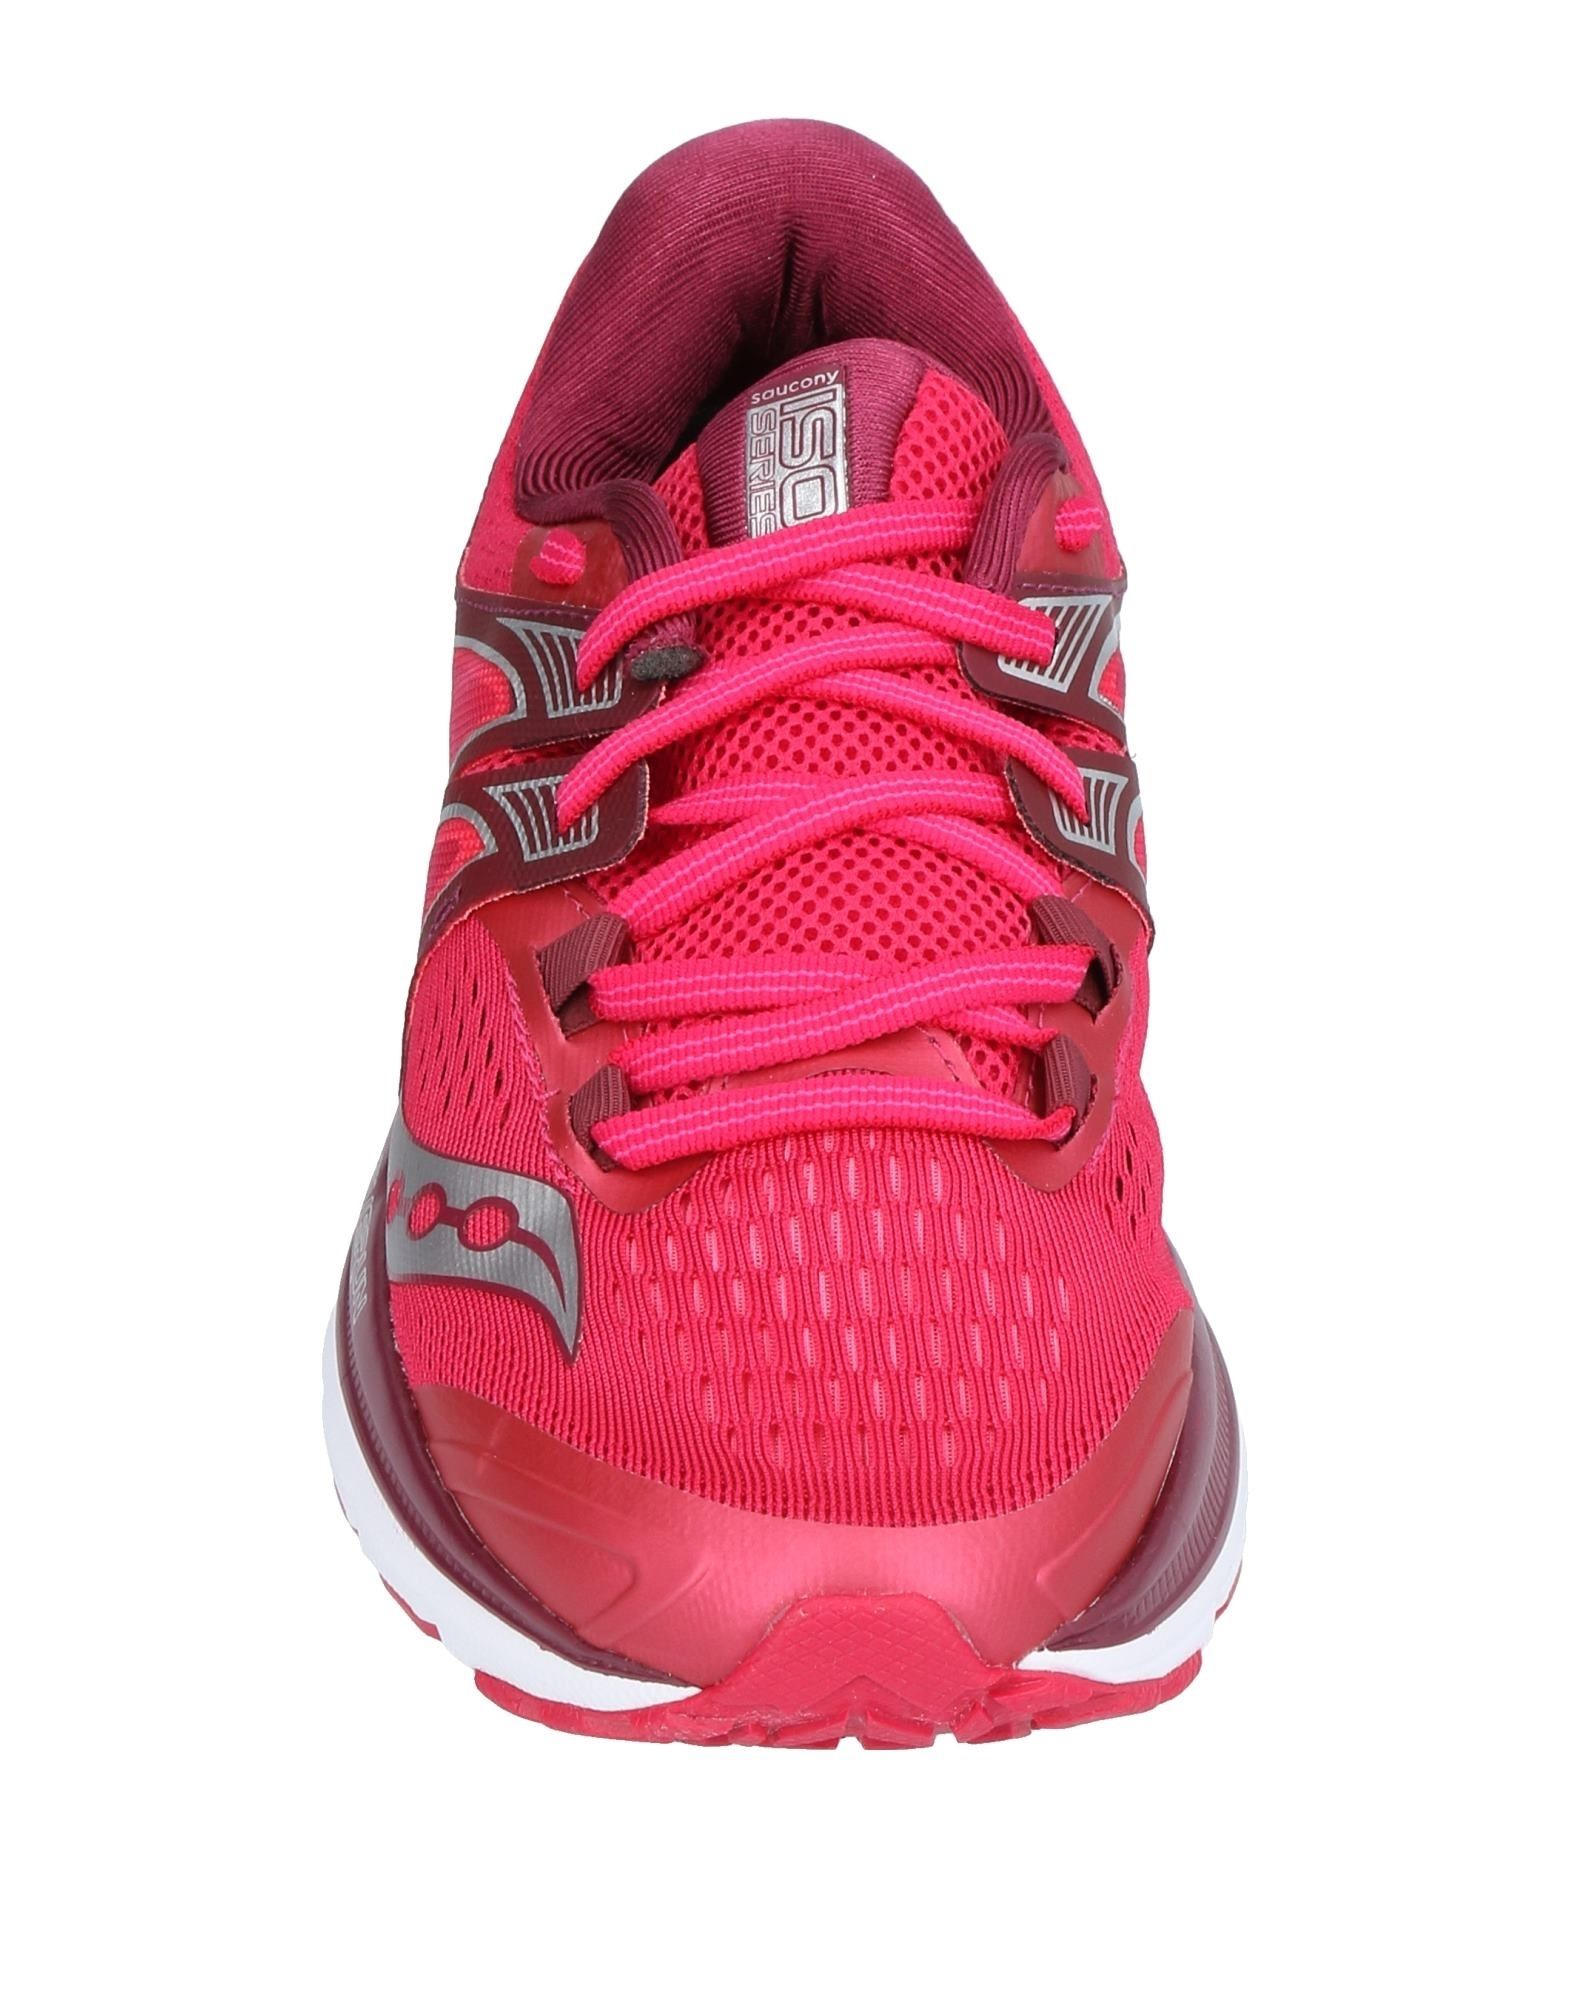 Saucony Sneakers Damen Damen Sneakers  11420873BO  50d75d